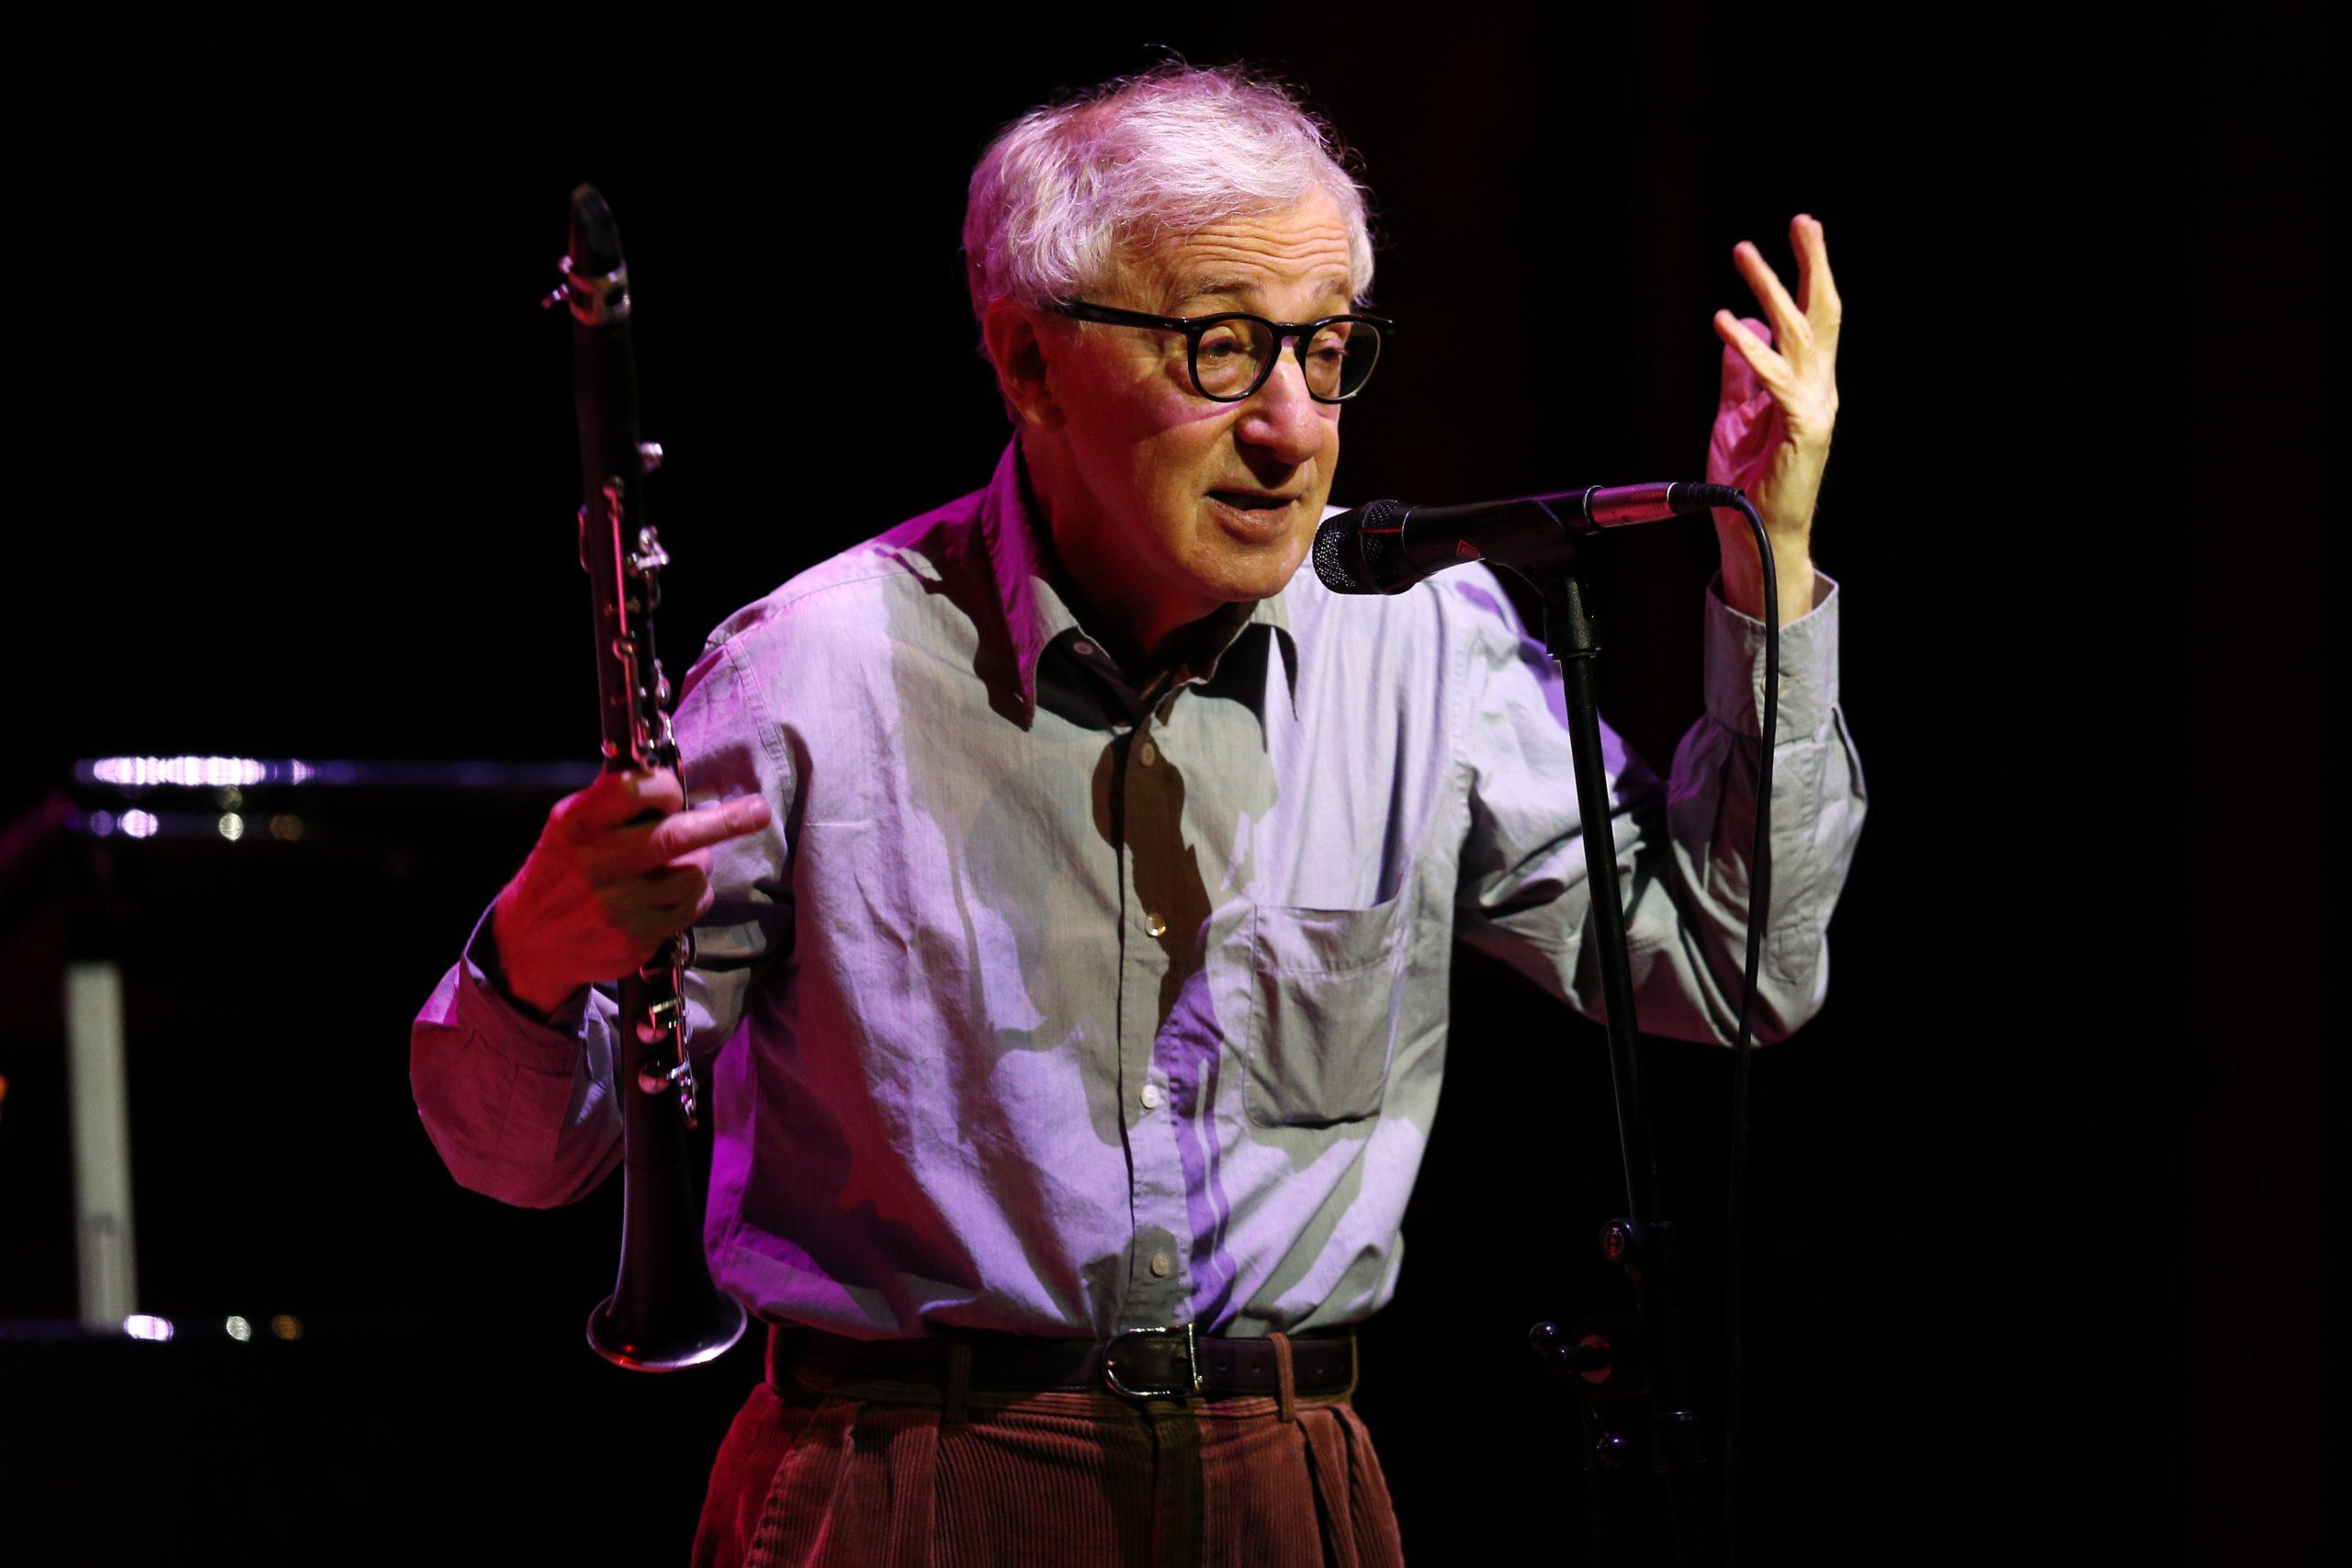 Le polemiche per Apropos of Nothing il memoir di Woody Allen